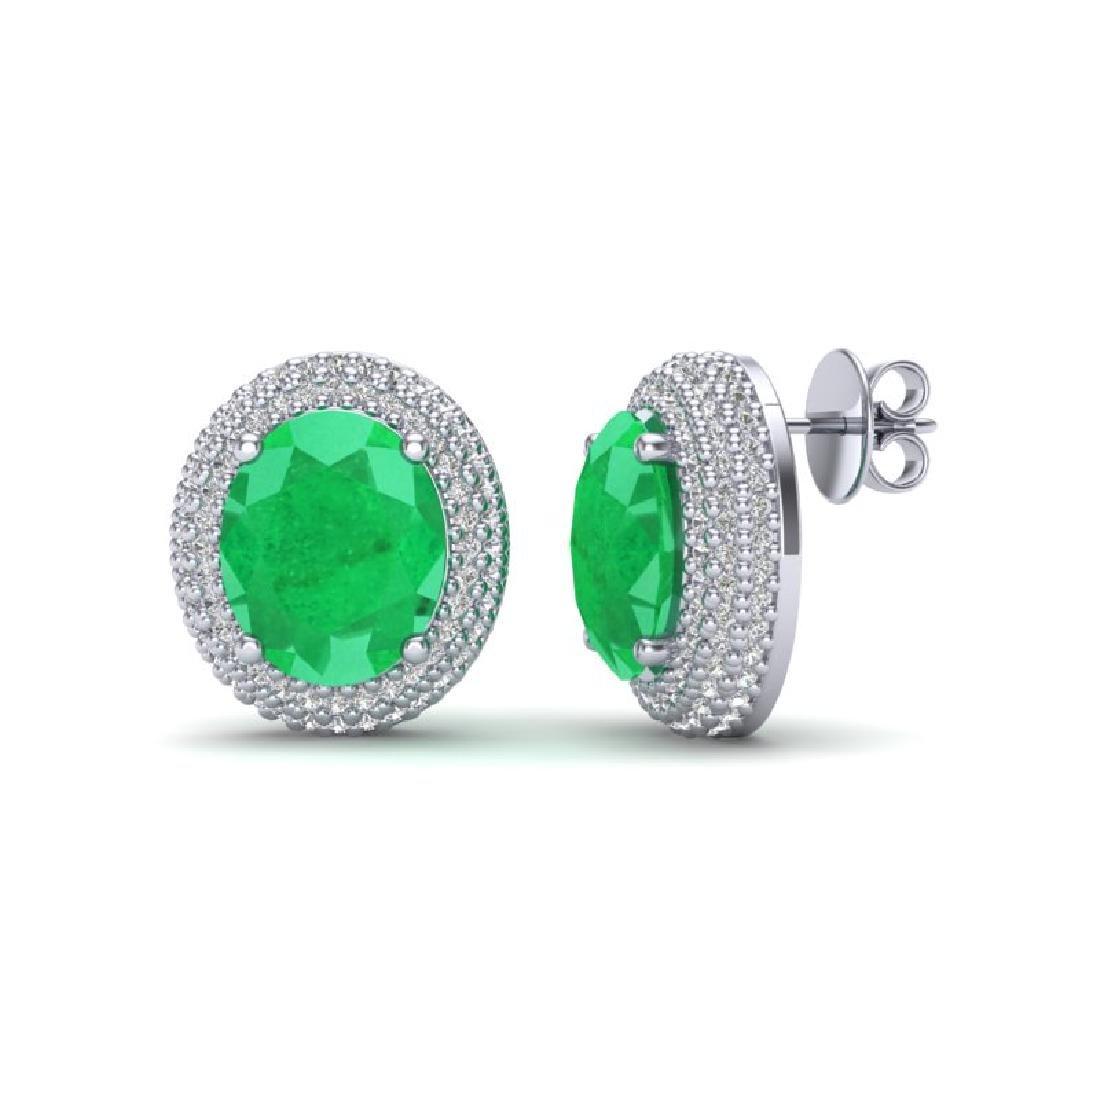 9.20 CTW Emerald & Micro Pave VS/SI Diamond Earrings - 2